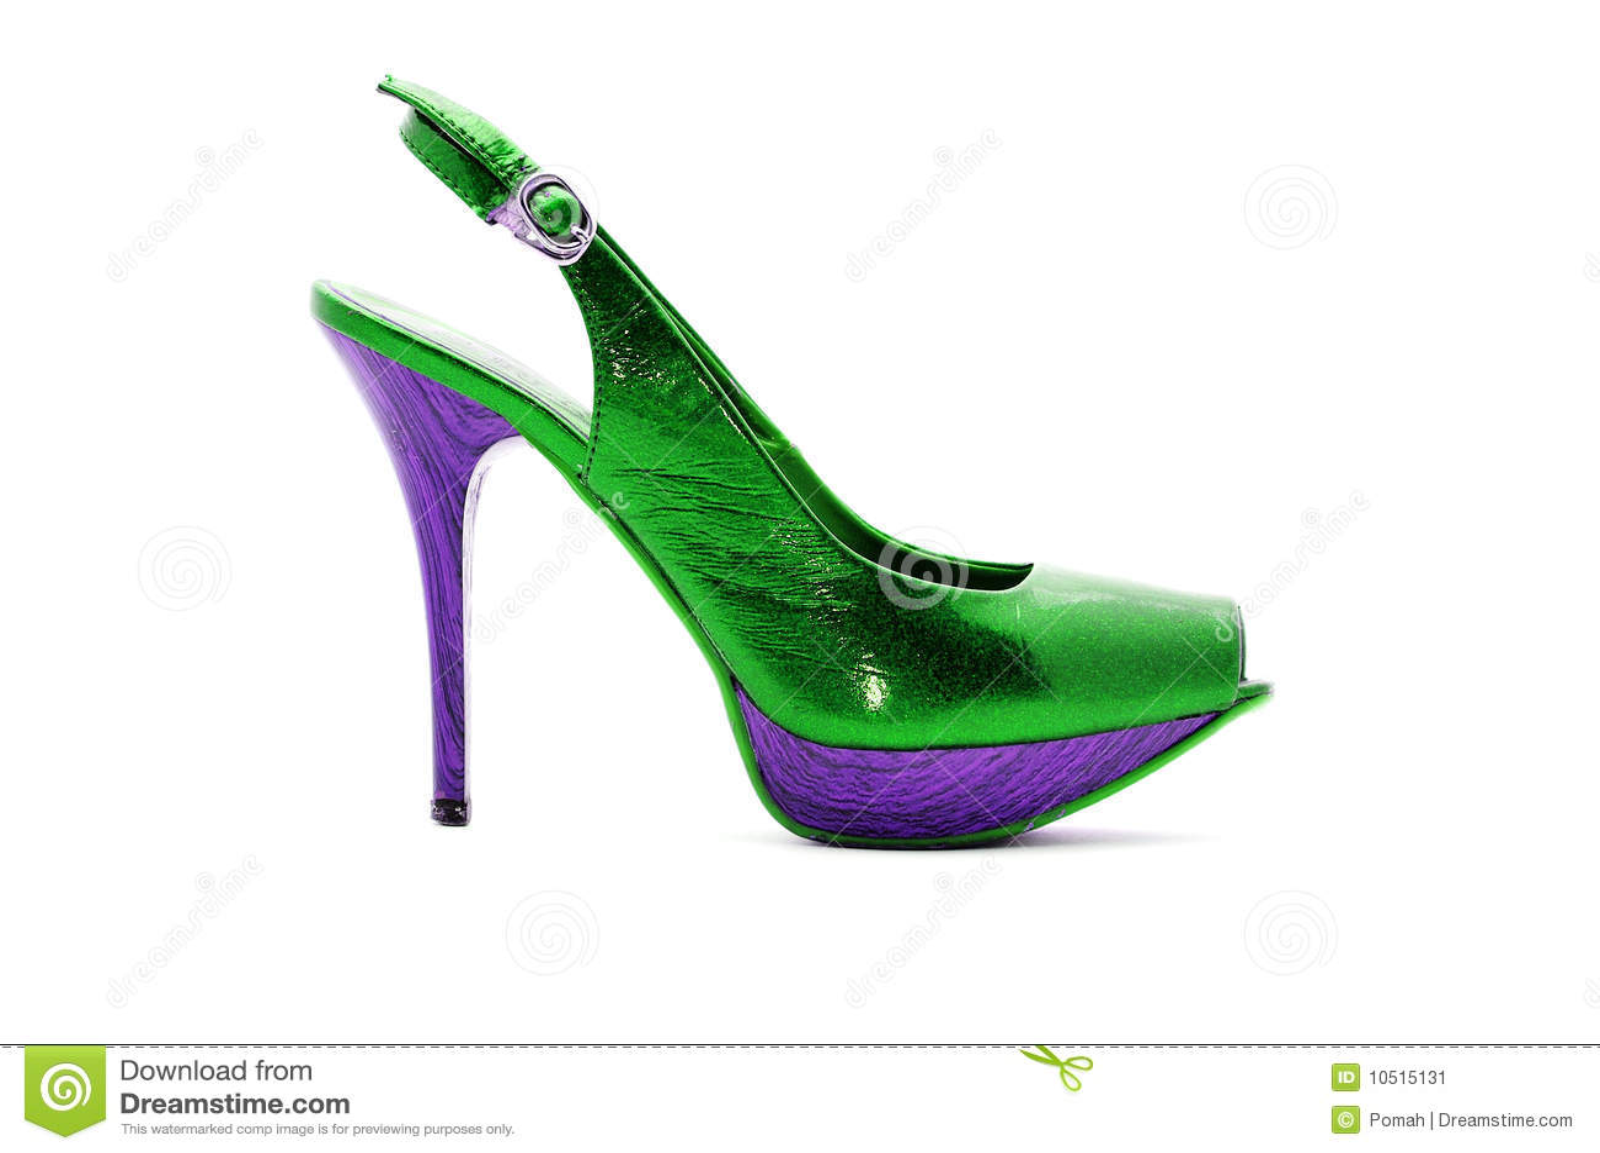 helt gratis dejtingsidor sexiga skor